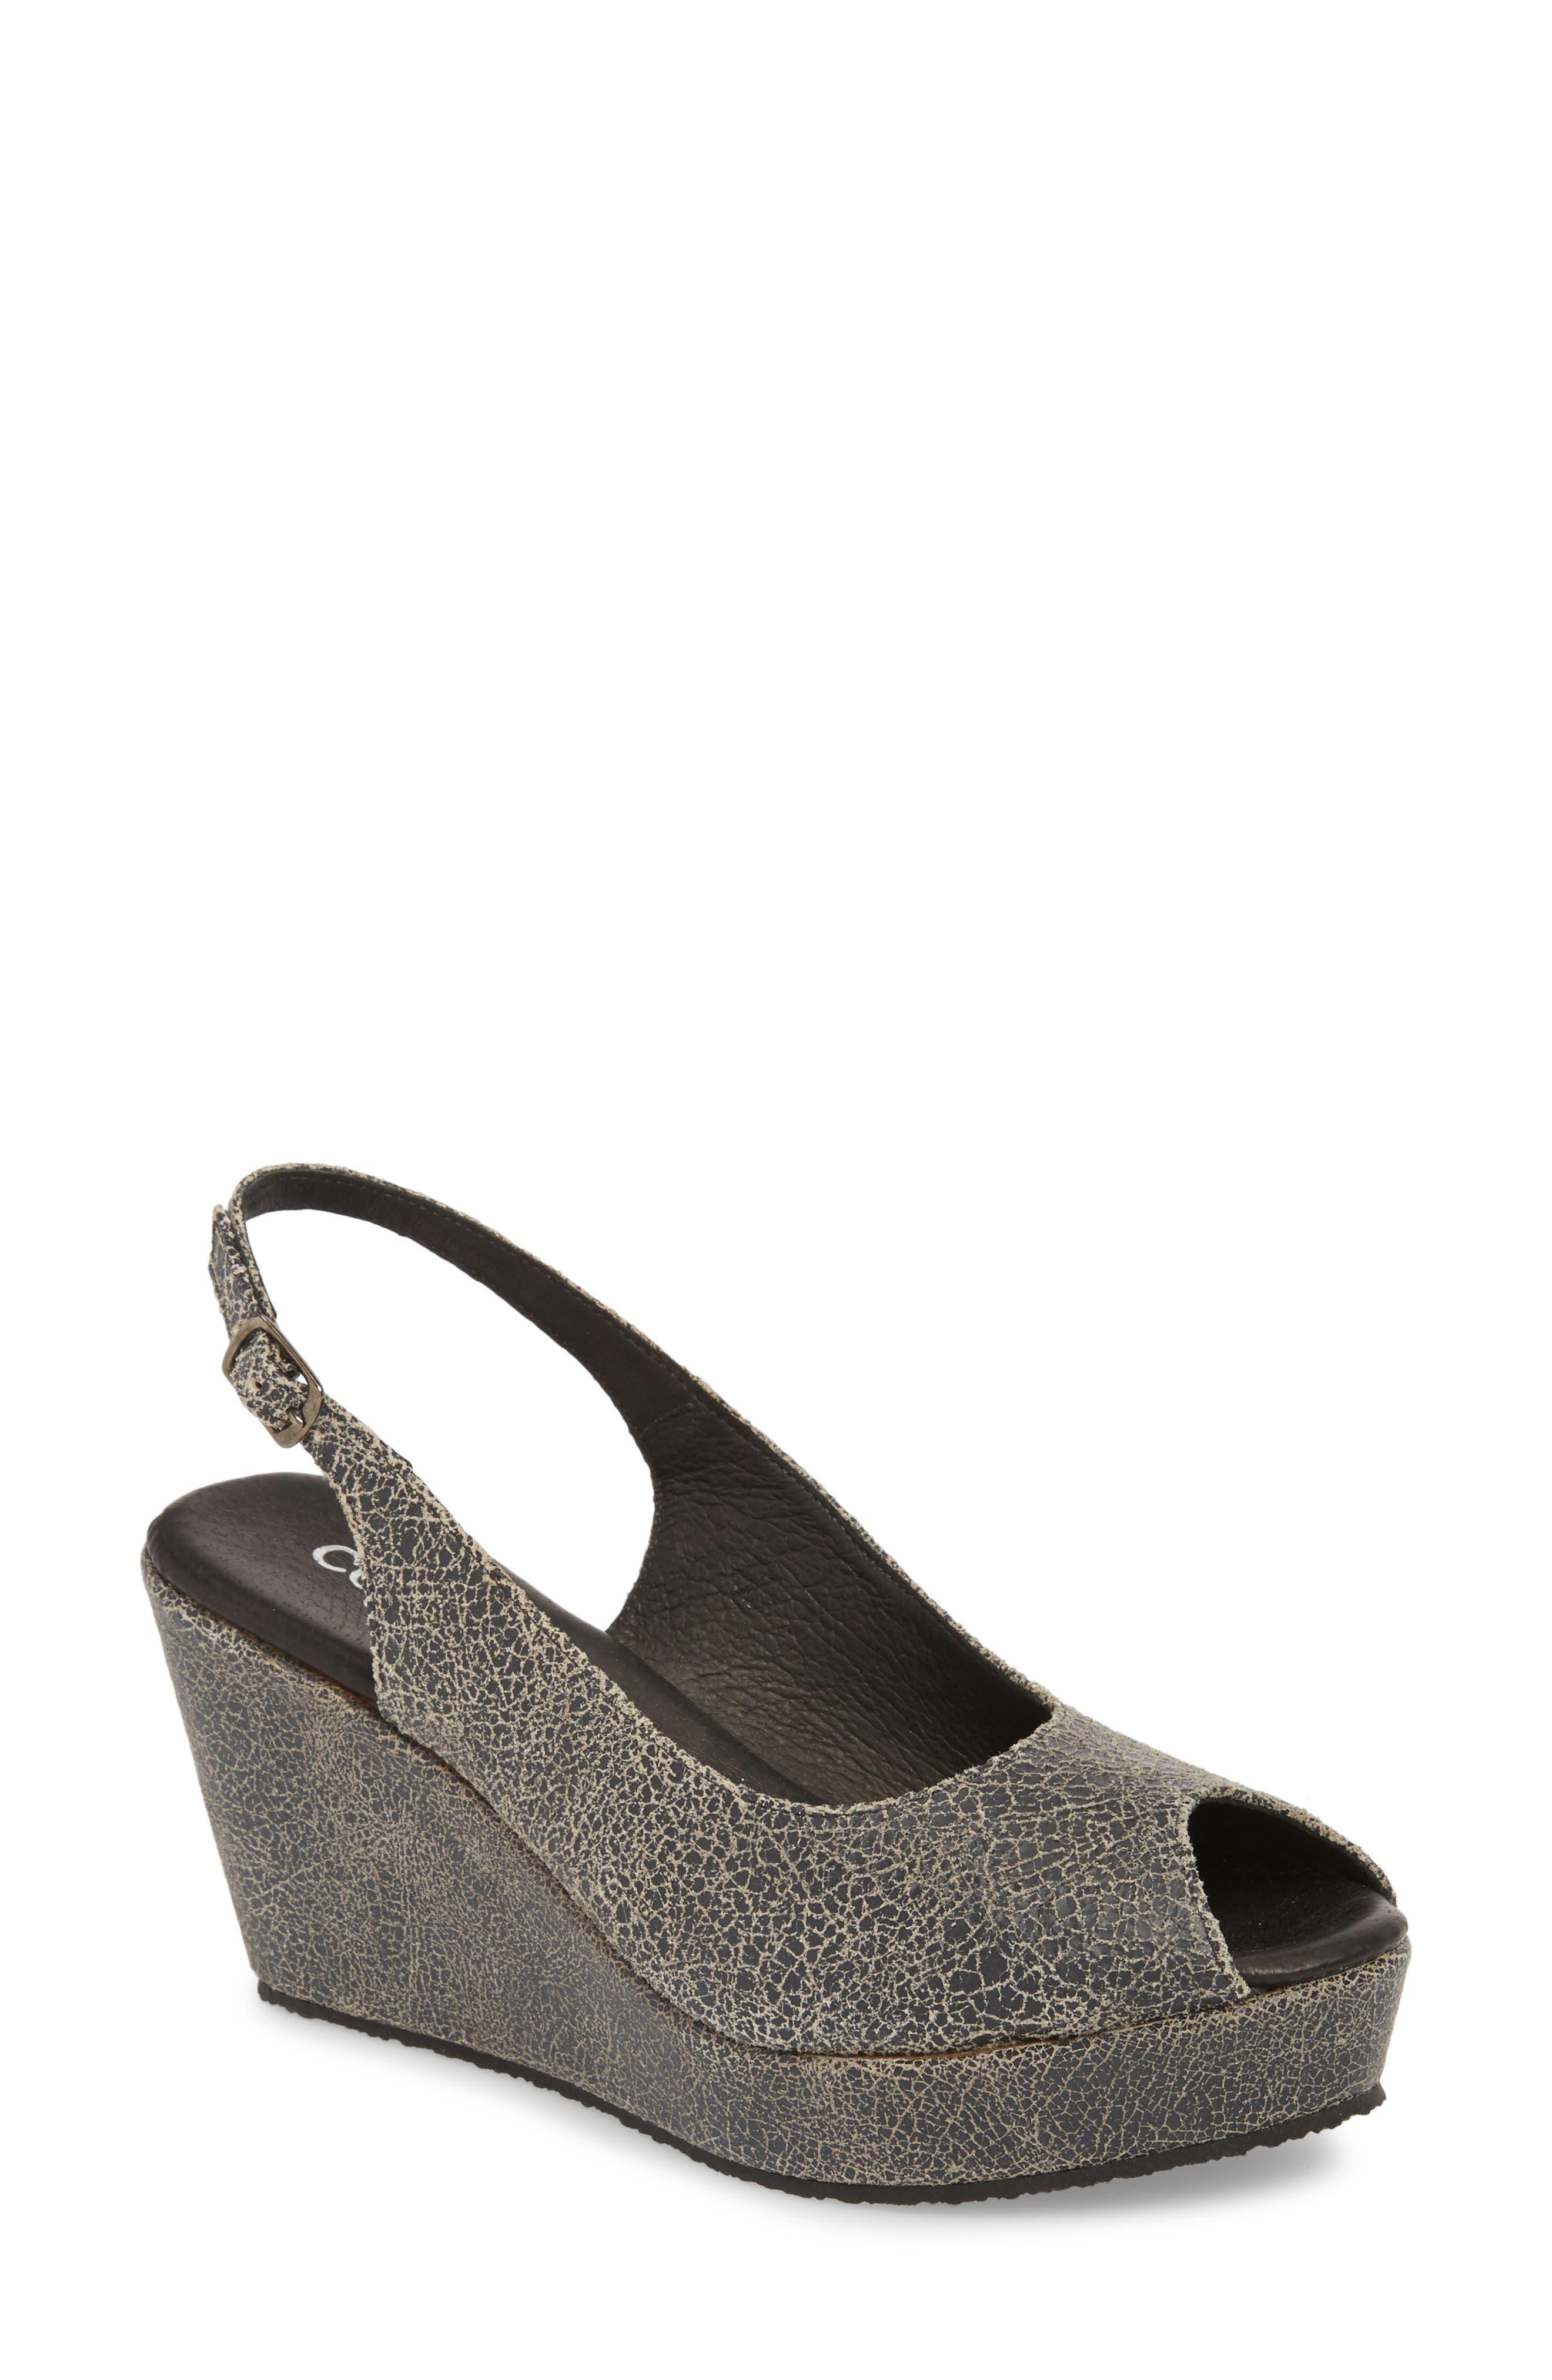 Image of CORDANI Fabrice Slingback Platform Sandal